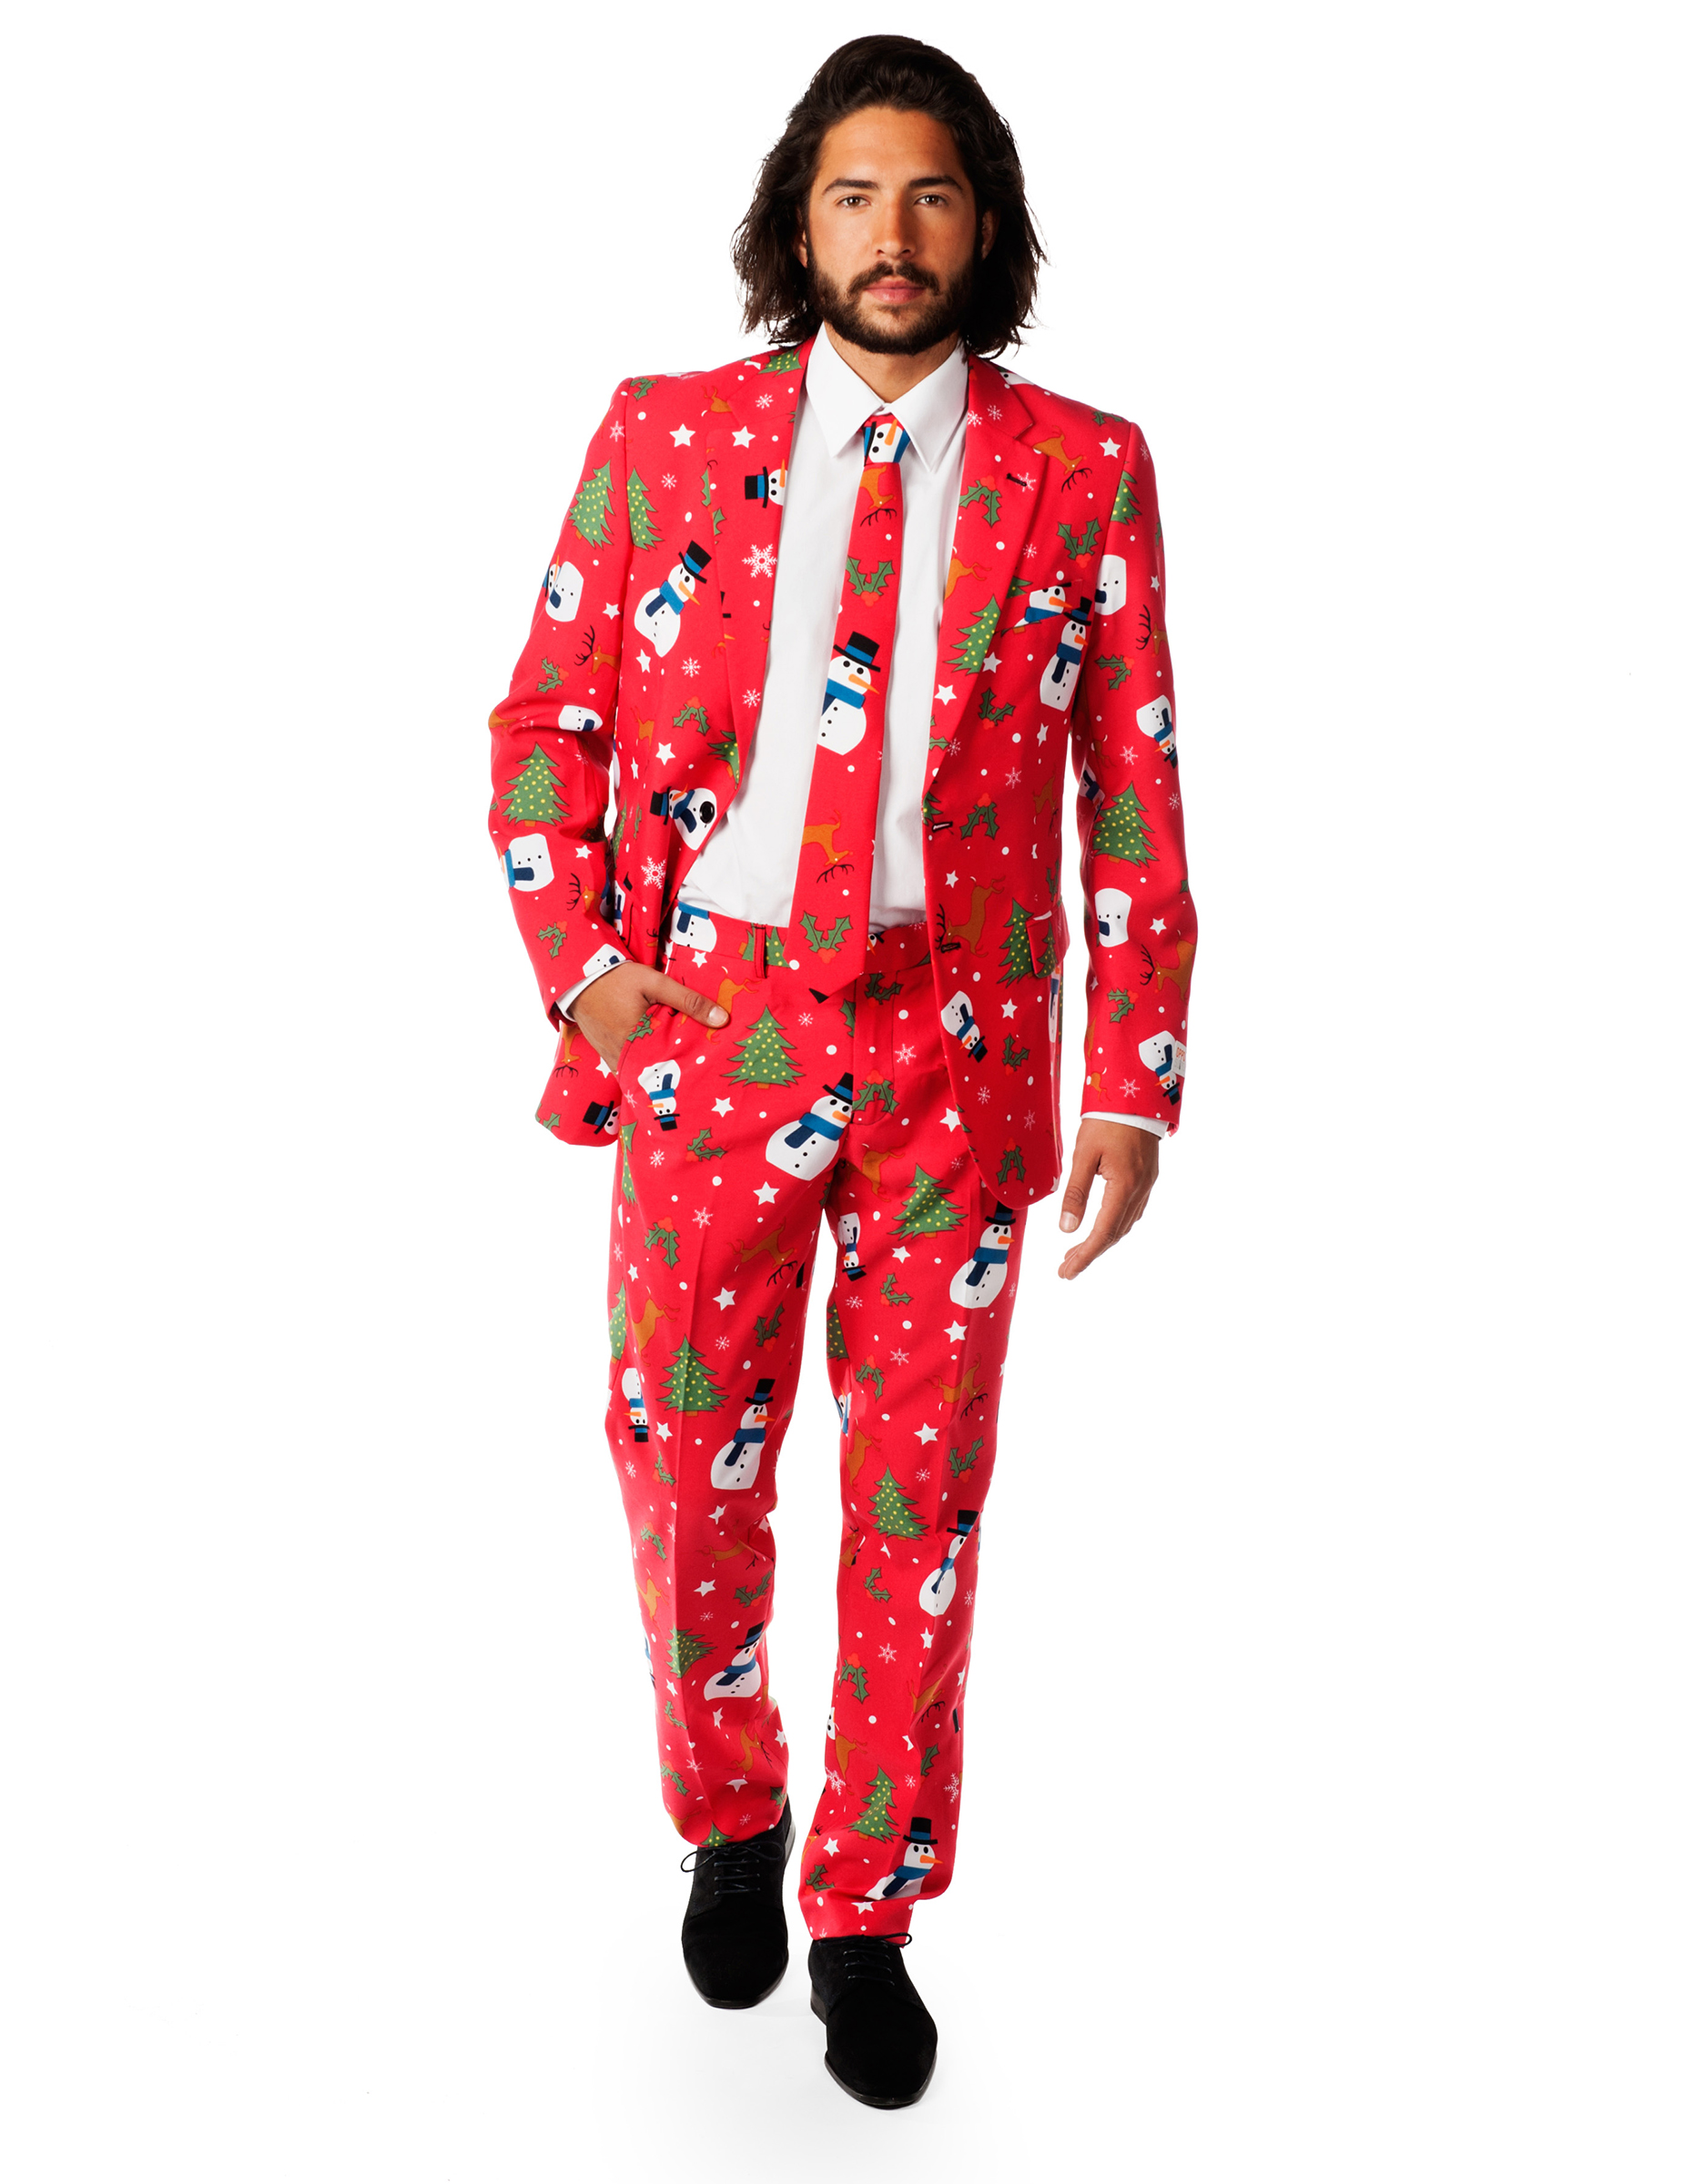 deguisement noel homme Costume Mr. Snowman homme Opposuits™ : Deguise toi, achat de  deguisement noel homme